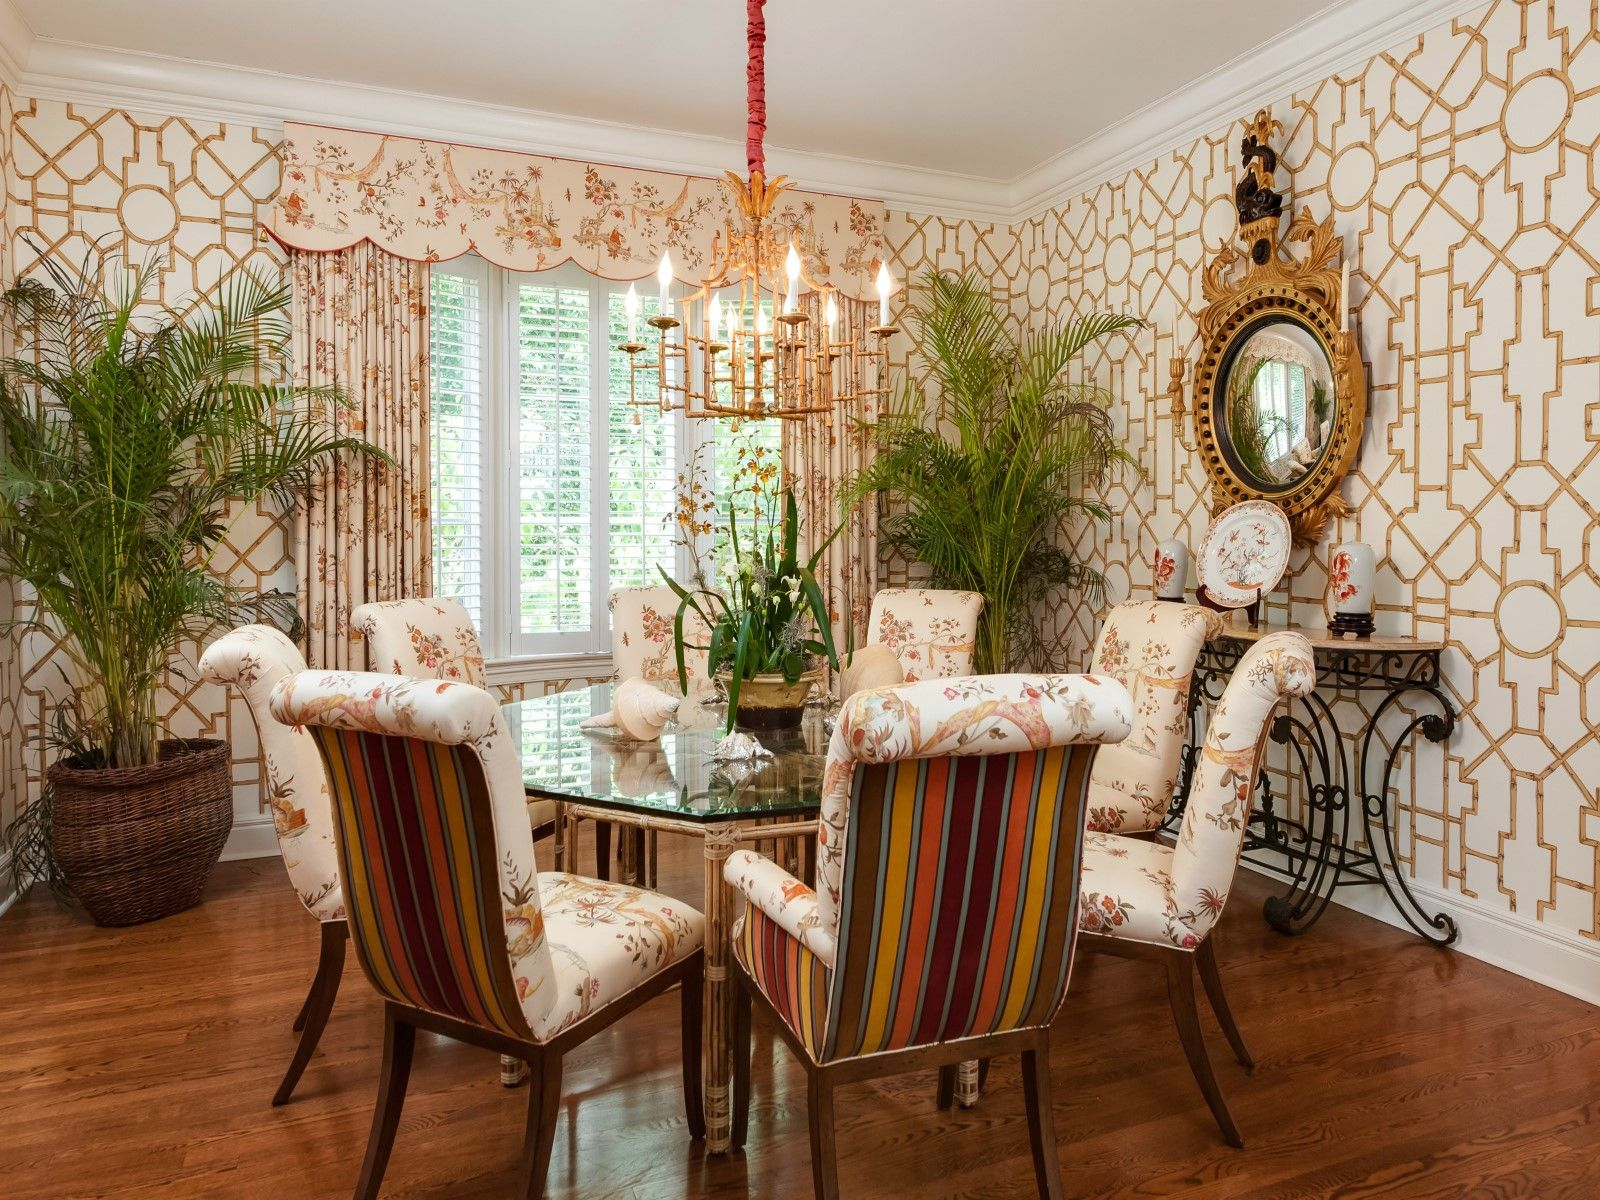 579 N Lake Way, Palm Beach FL Single Family Home - Palm Beach Real Estate